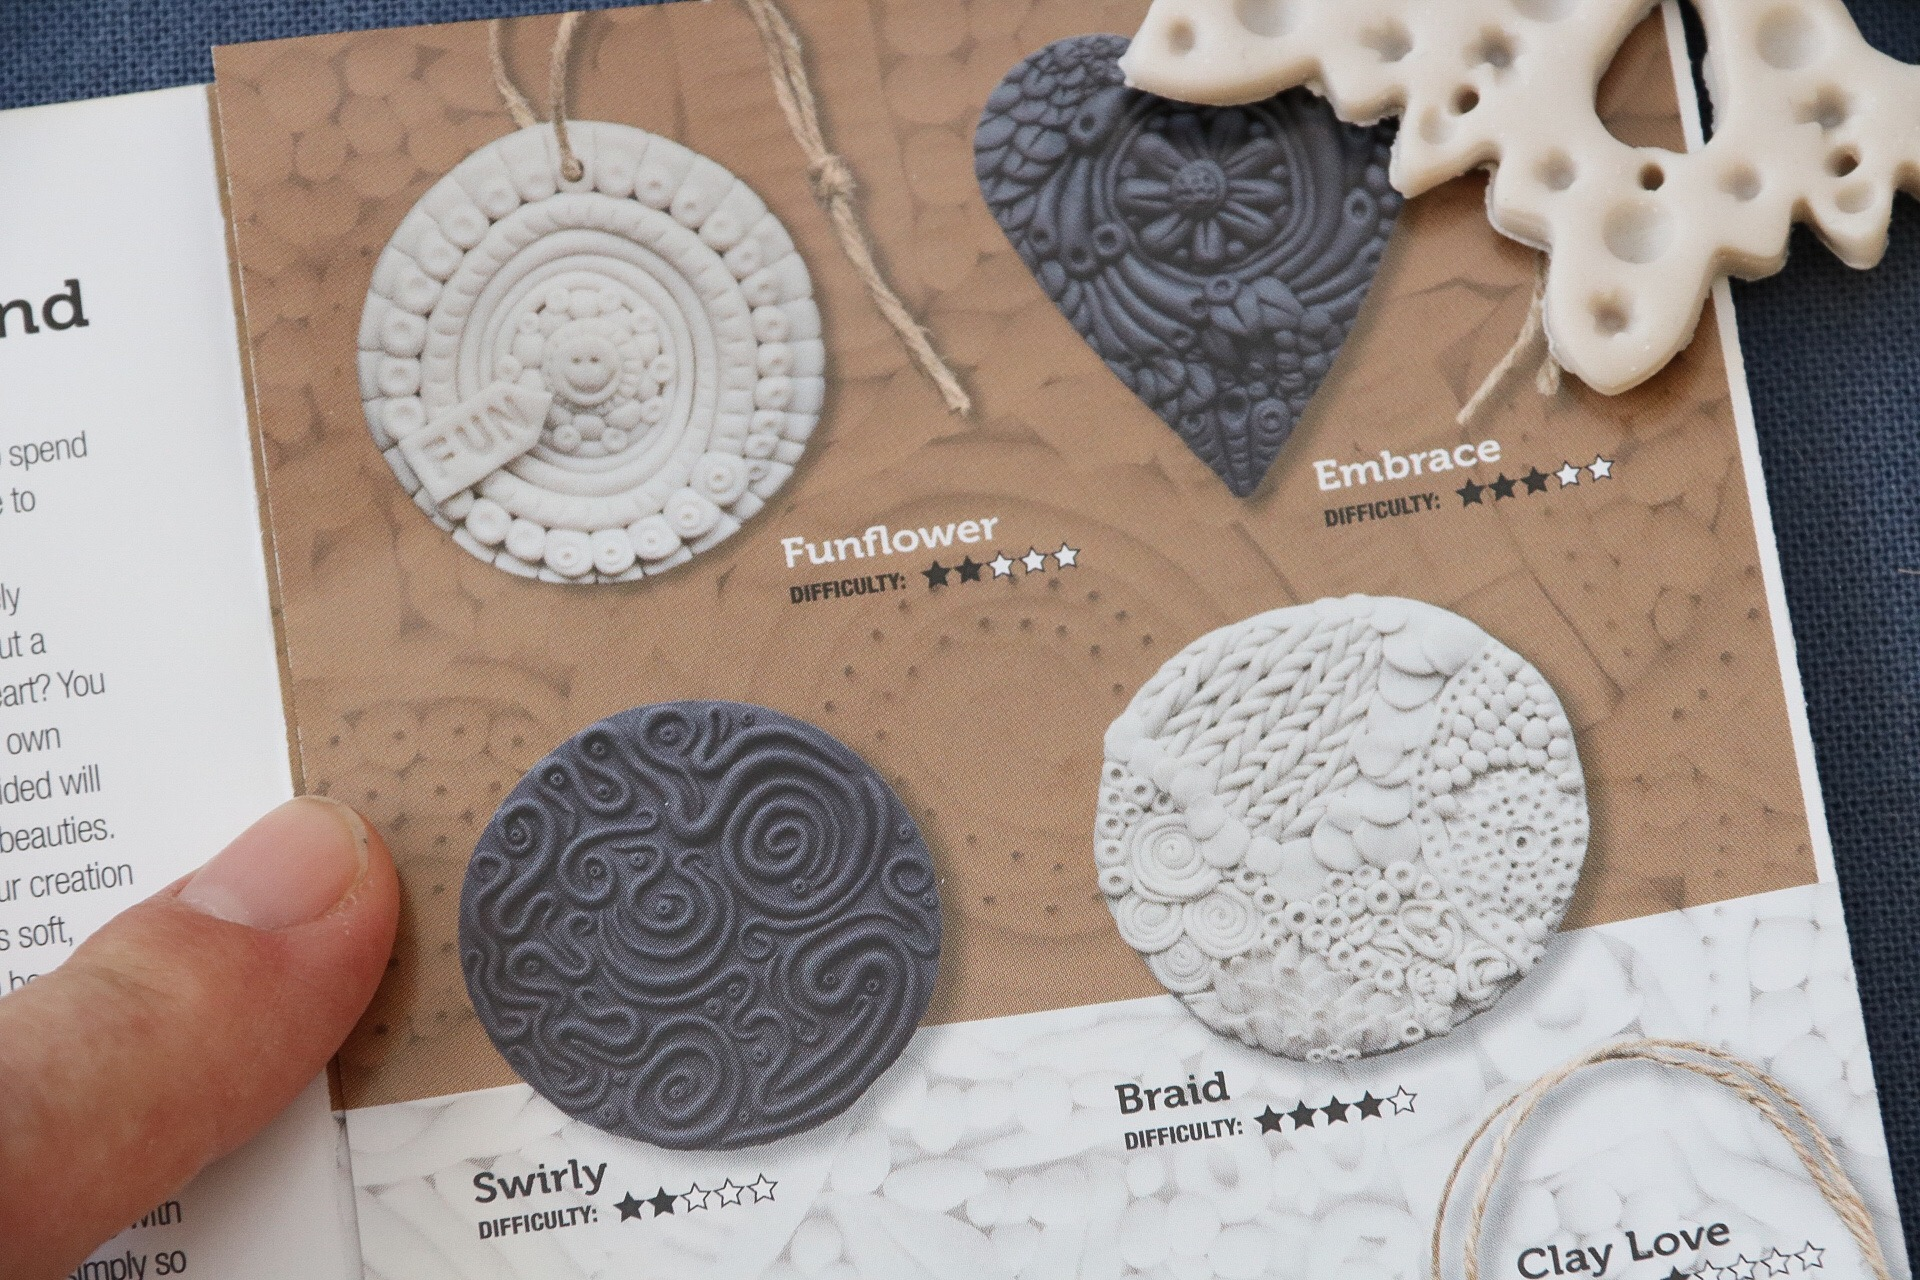 Doodle clay